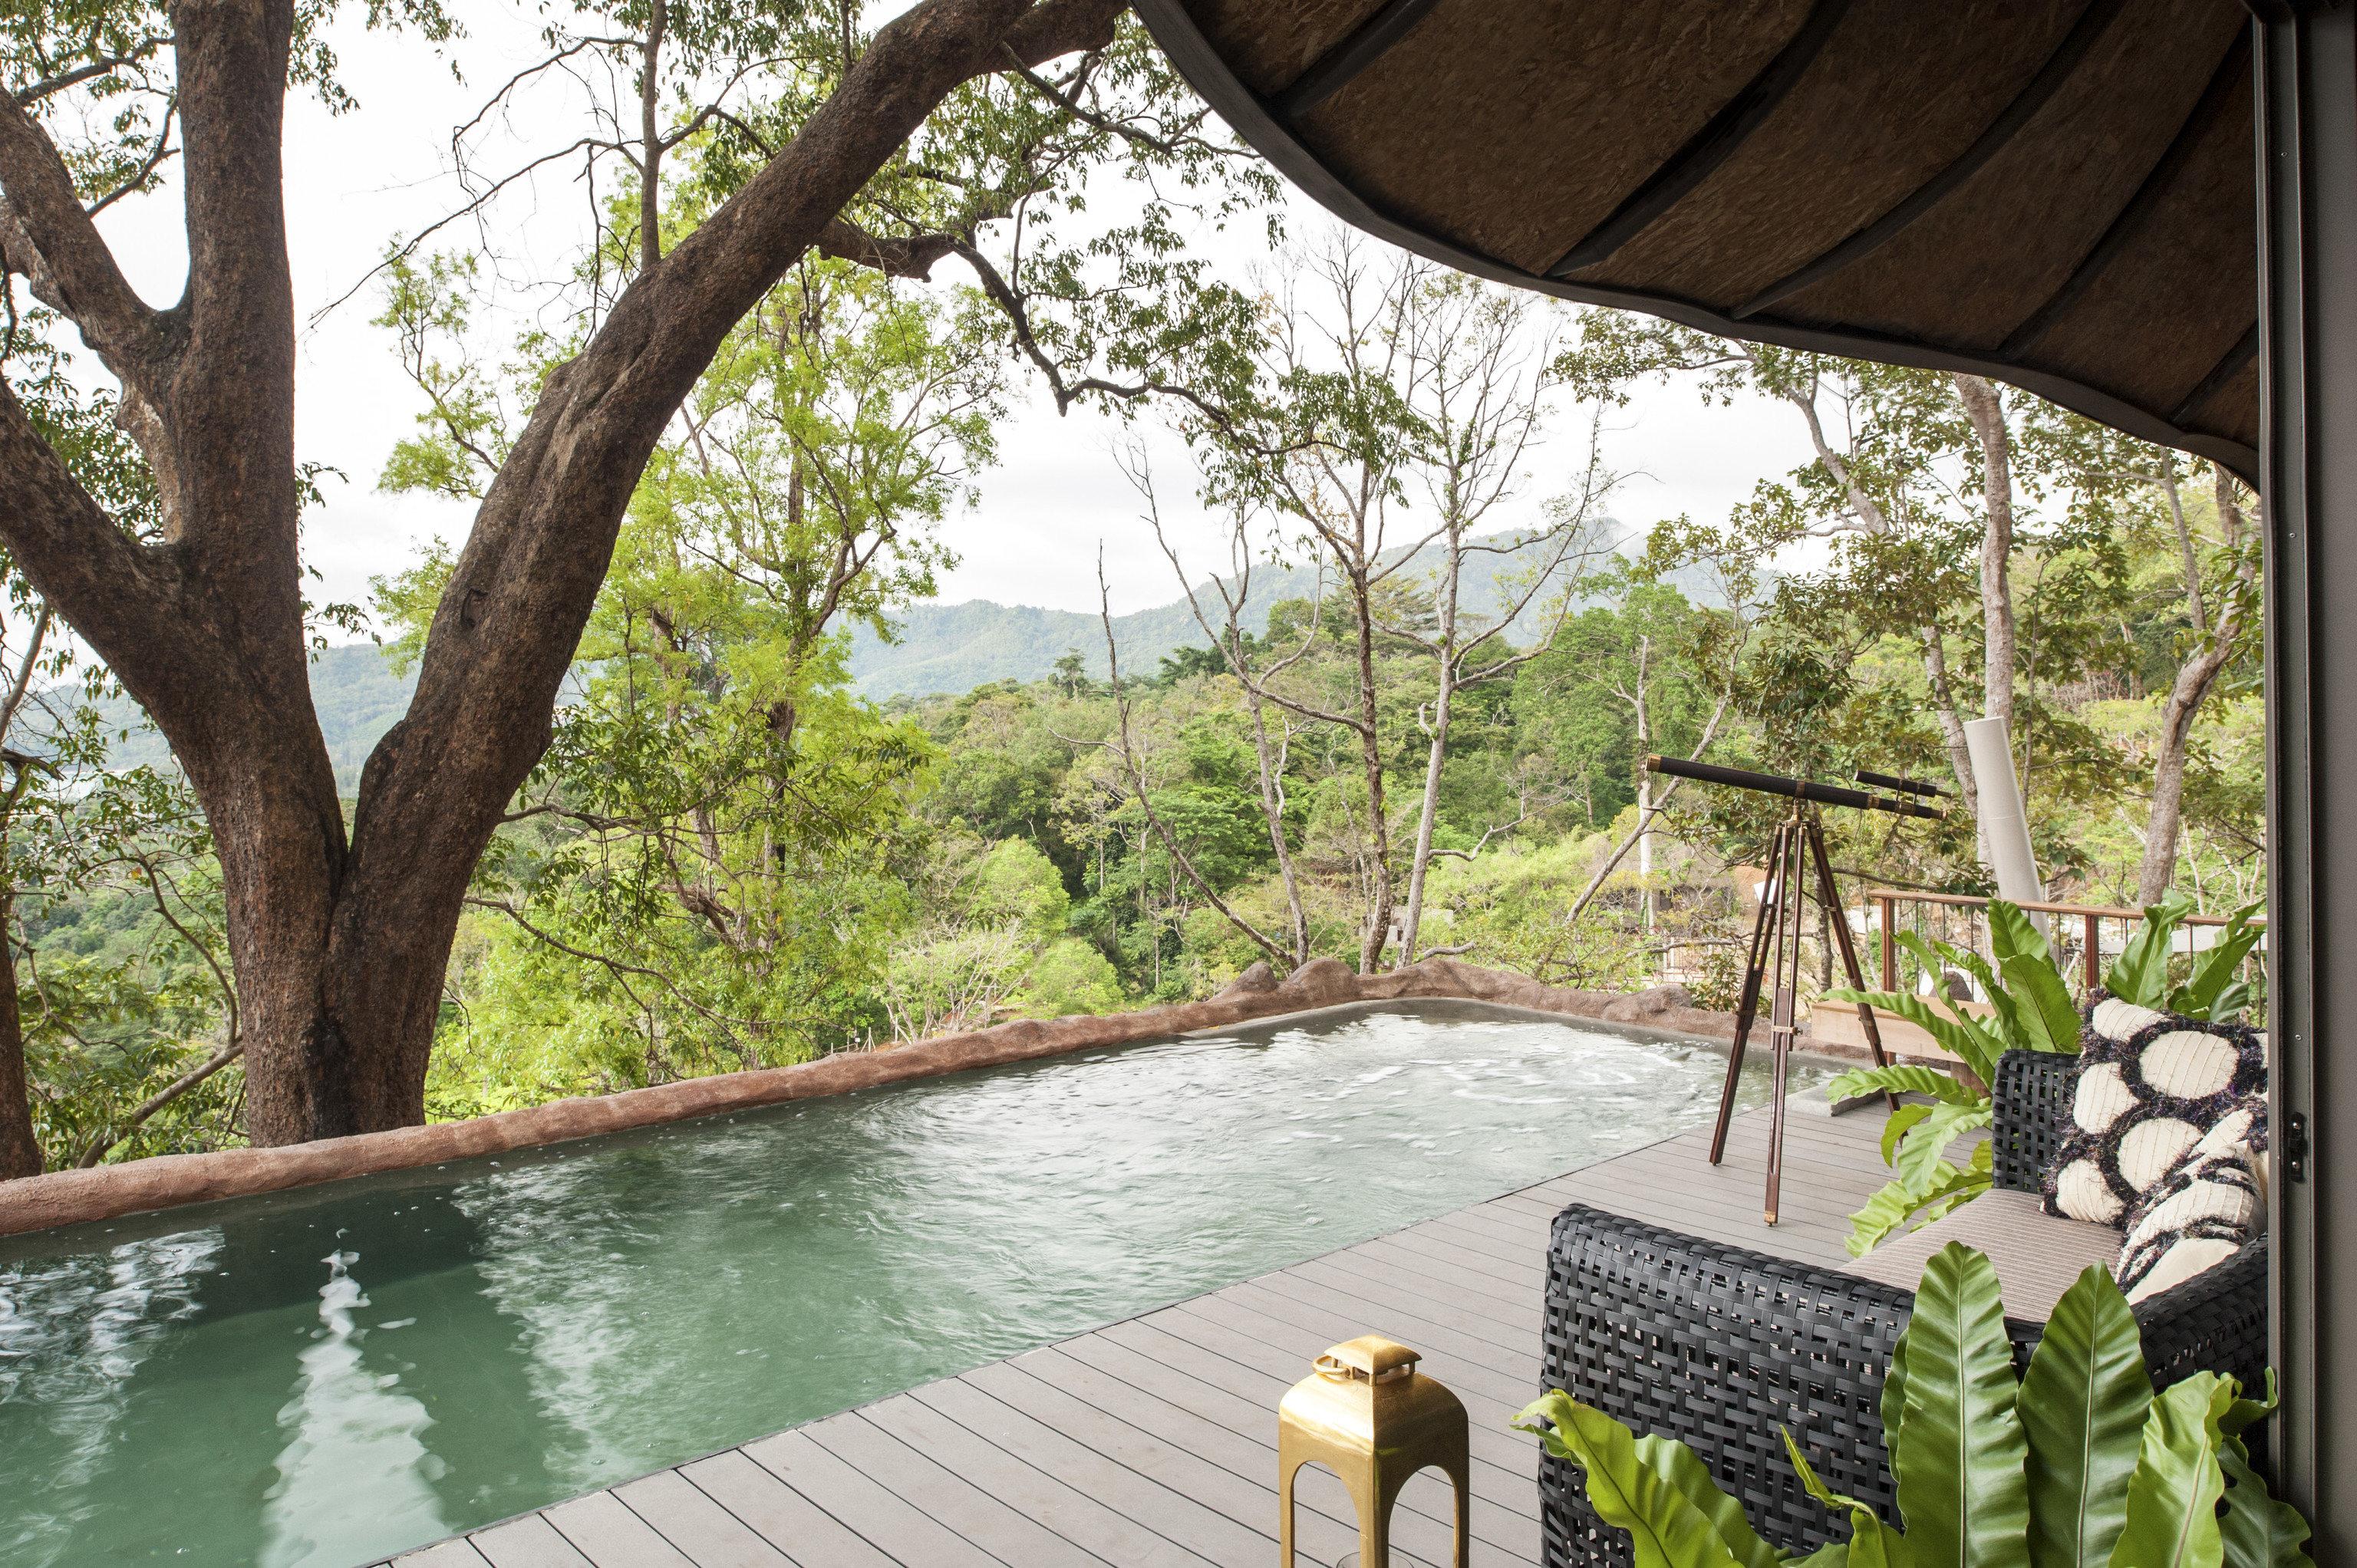 Hotels Trip Ideas tree outdoor property swimming pool estate backyard Villa Resort cottage shade